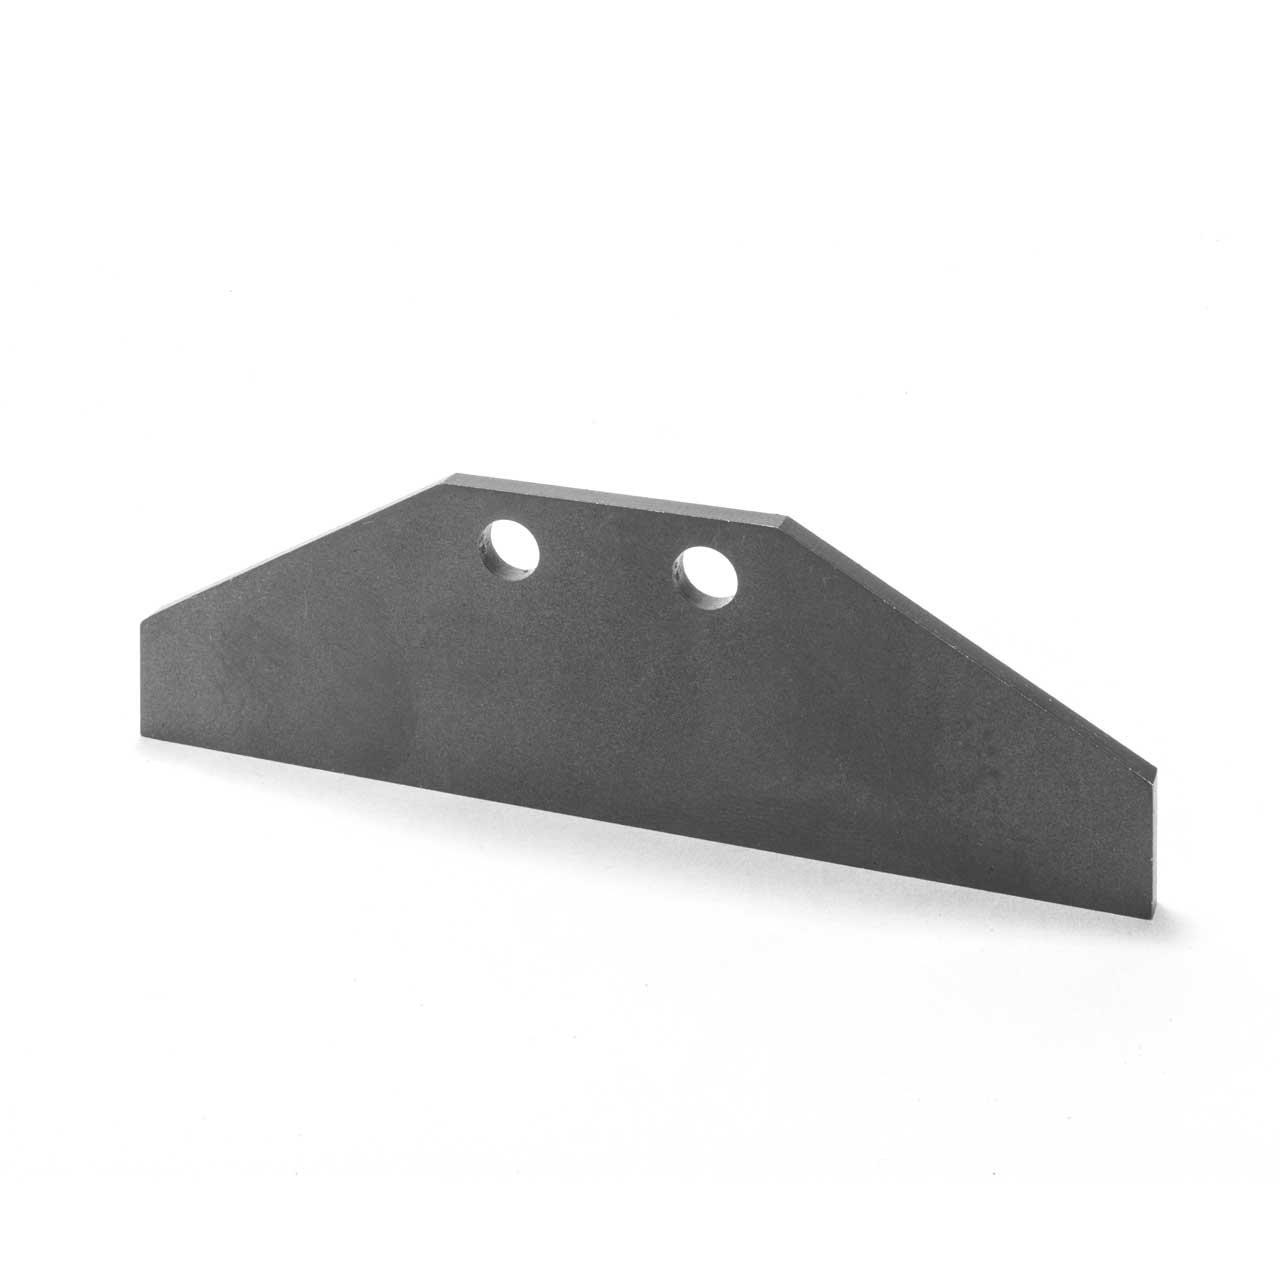 Scrape-N-Burr RNB-45 Replacement Blade 4-1/2''